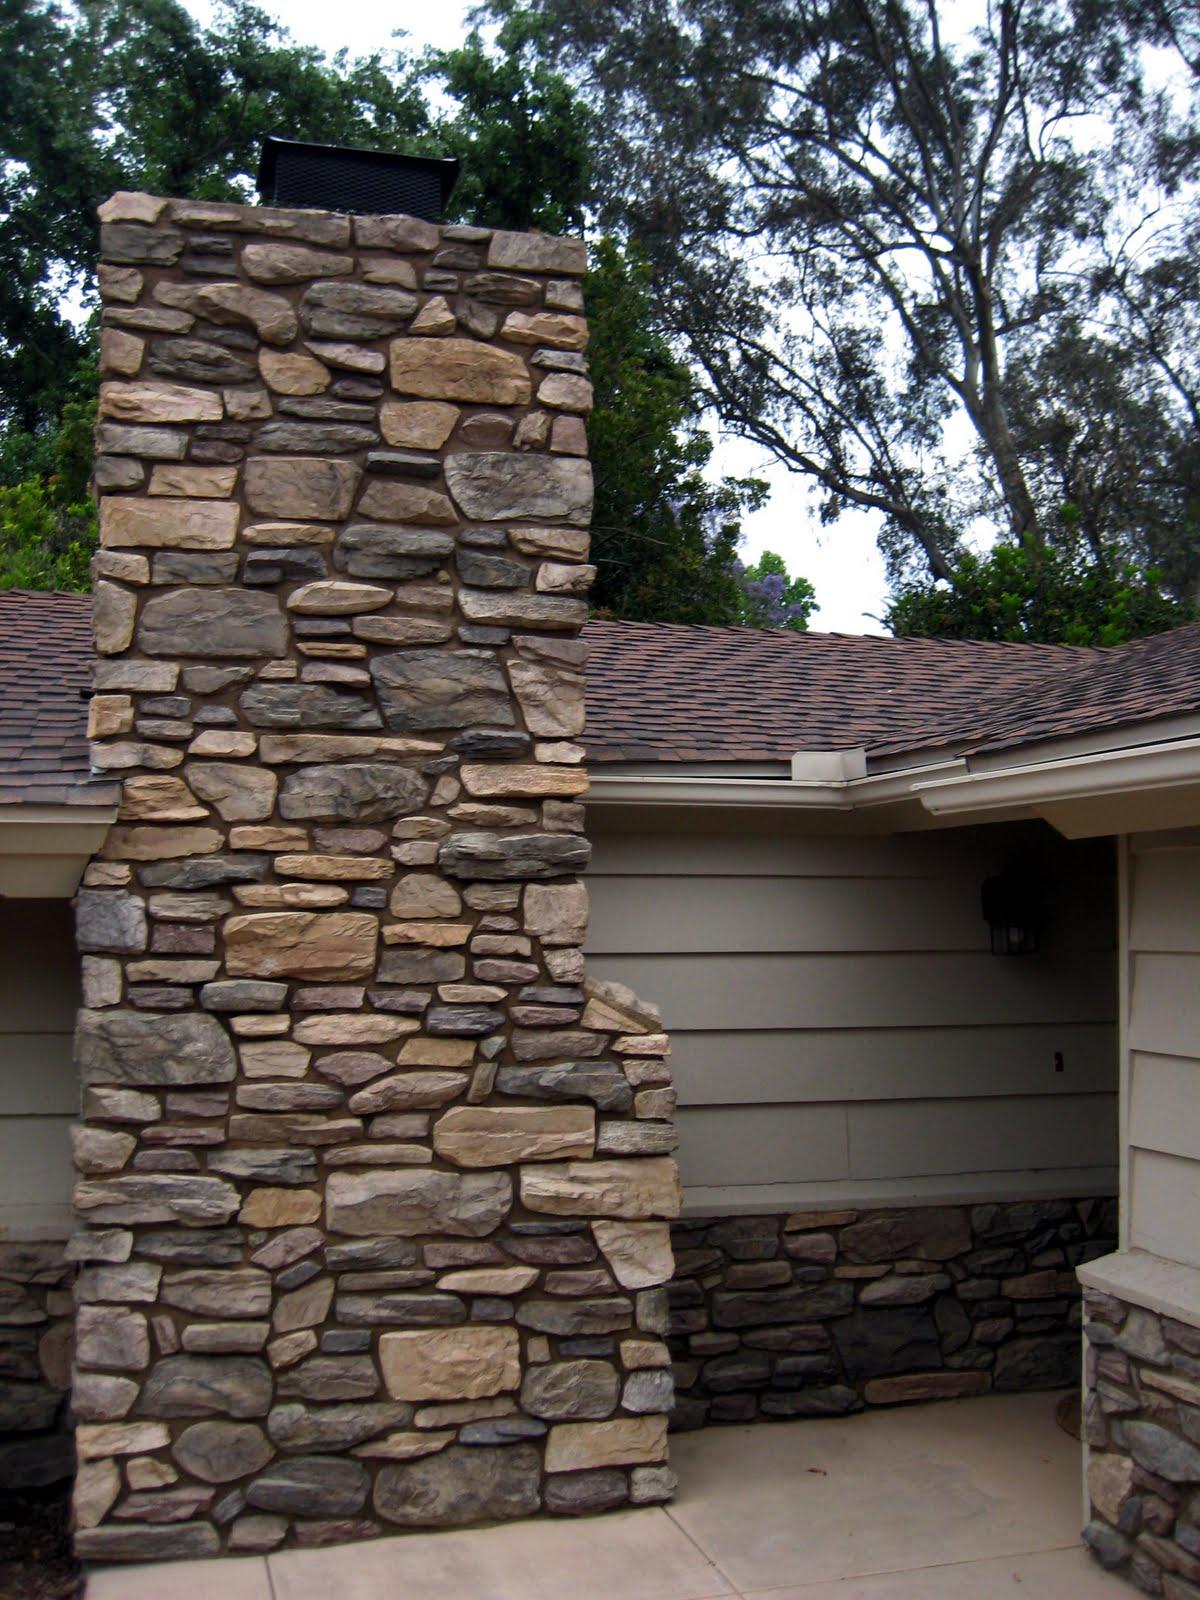 Mizisin contracting services stone veneer chimney for Stone chimneys